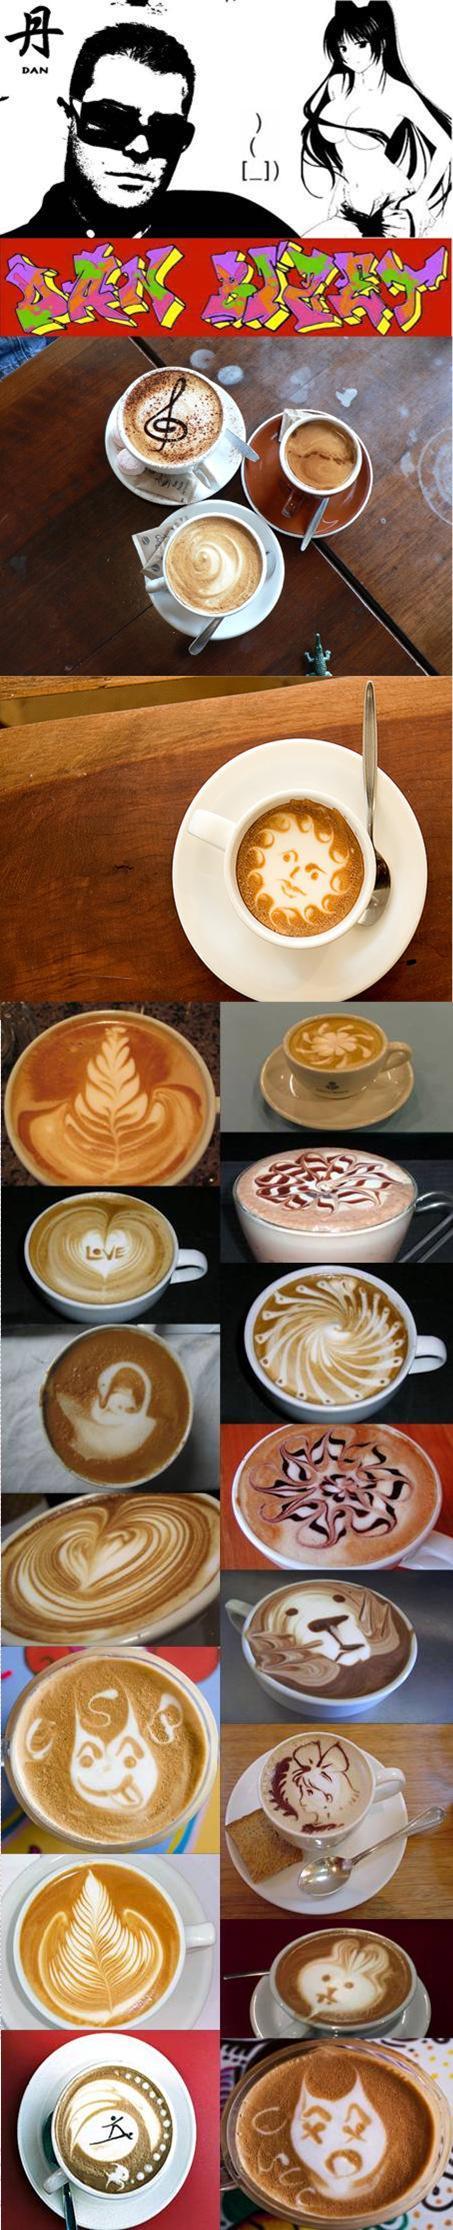 Cool Coffee Art